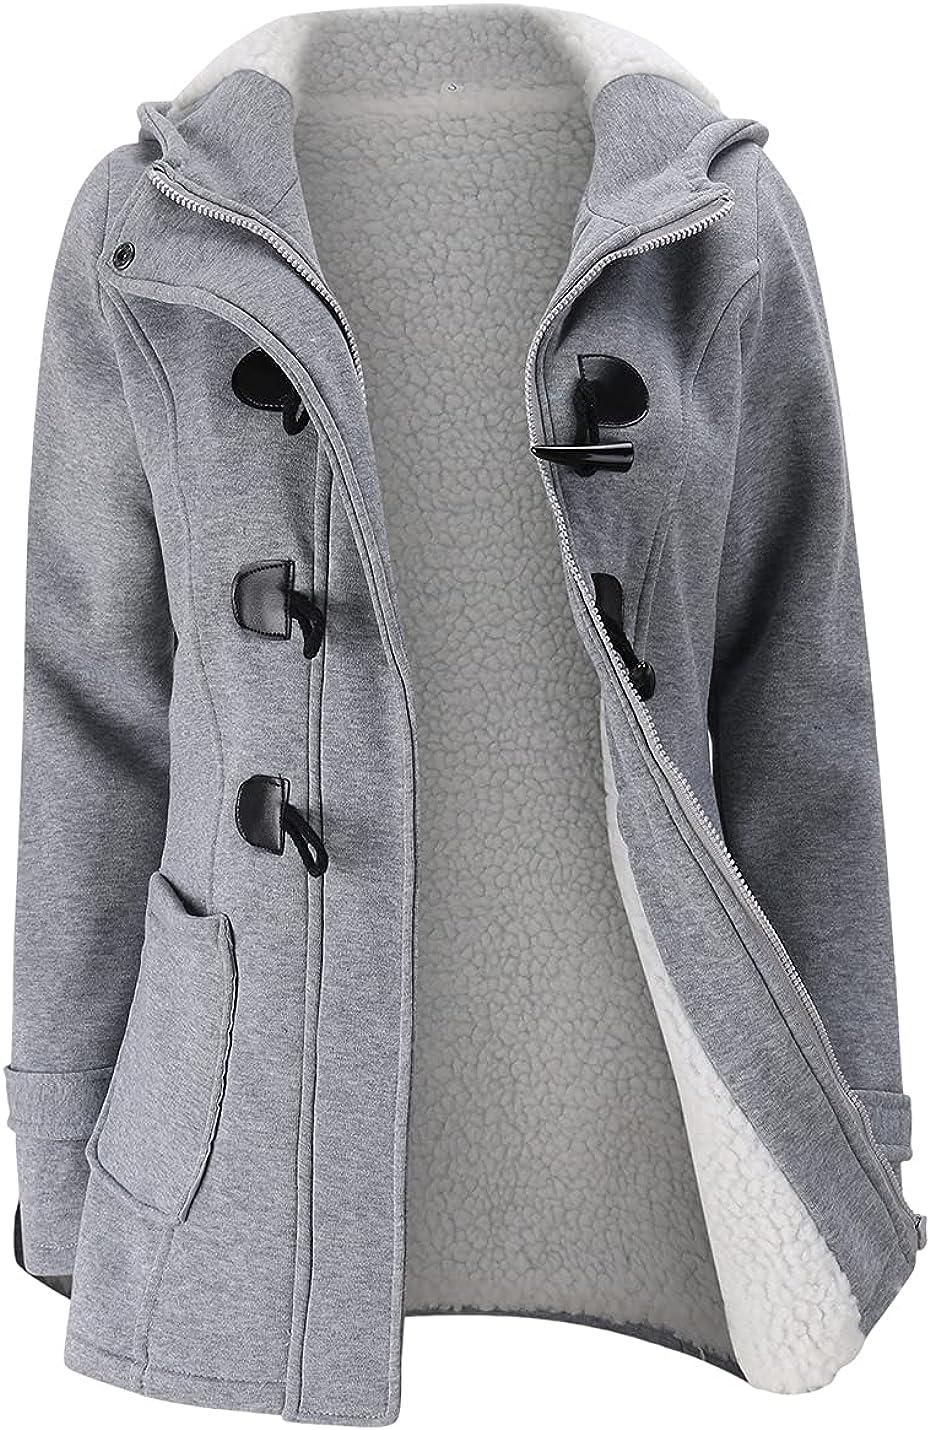 Xishiloft Womens Hooded Lamb Wool Button Horn Selling and selling Fleece online shop Jacket Line